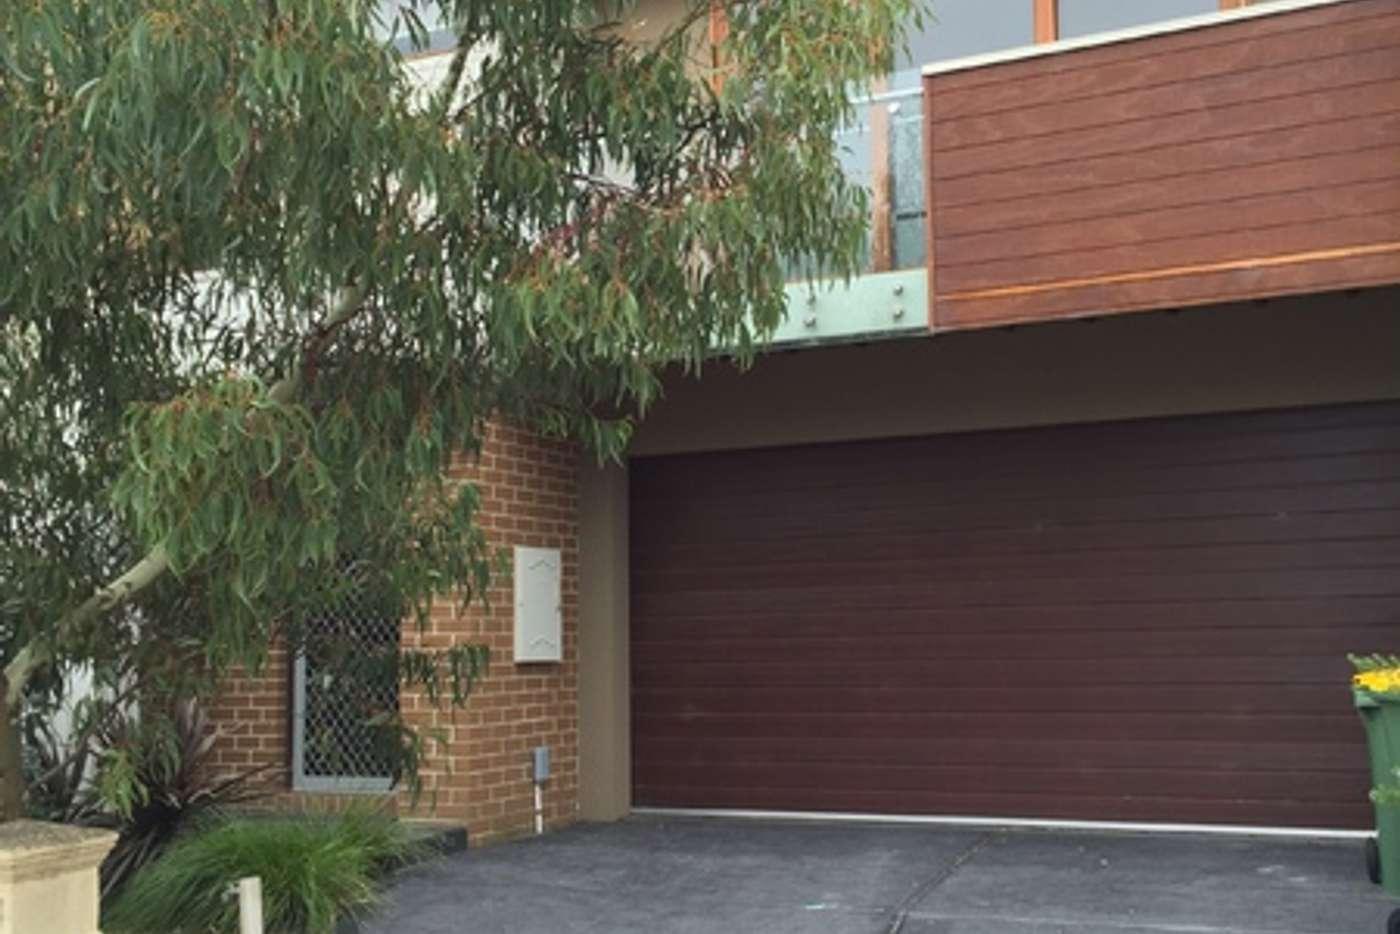 Main view of Homely townhouse listing, 19 Kilburn Place, Pakenham VIC 3810